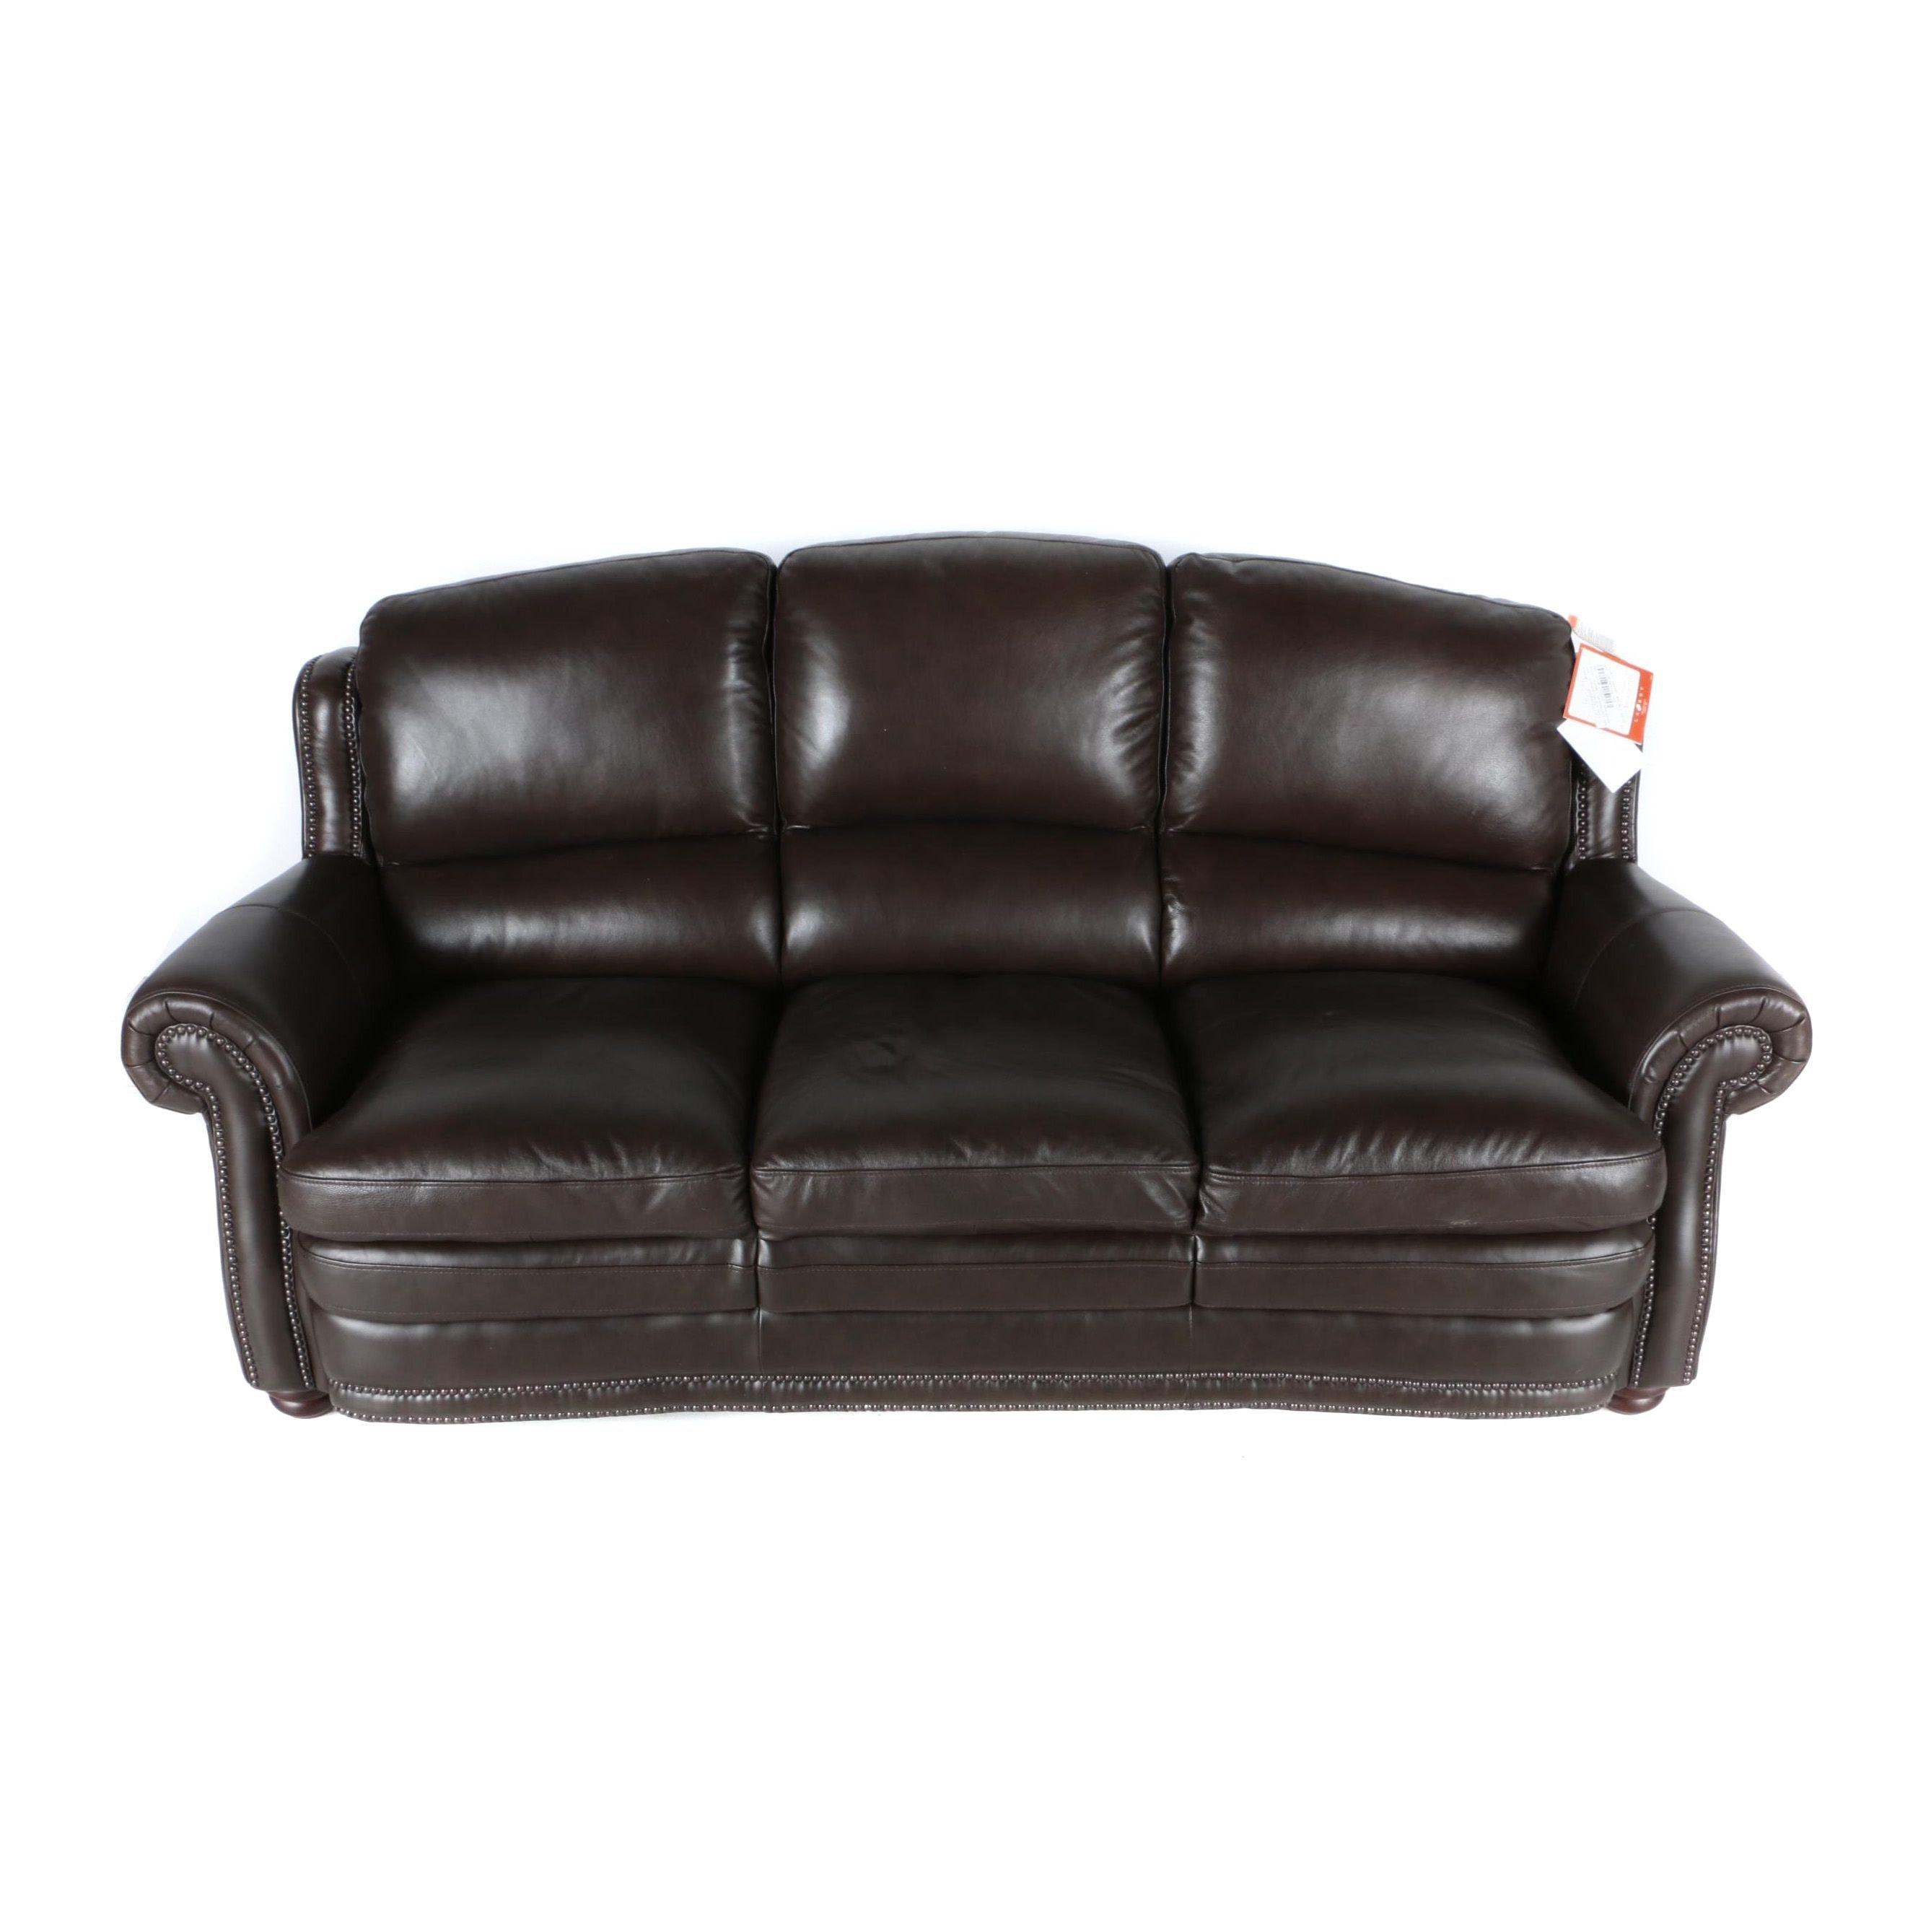 Gideon Dark Brown Leather Sofa by La Z Boy EBTH